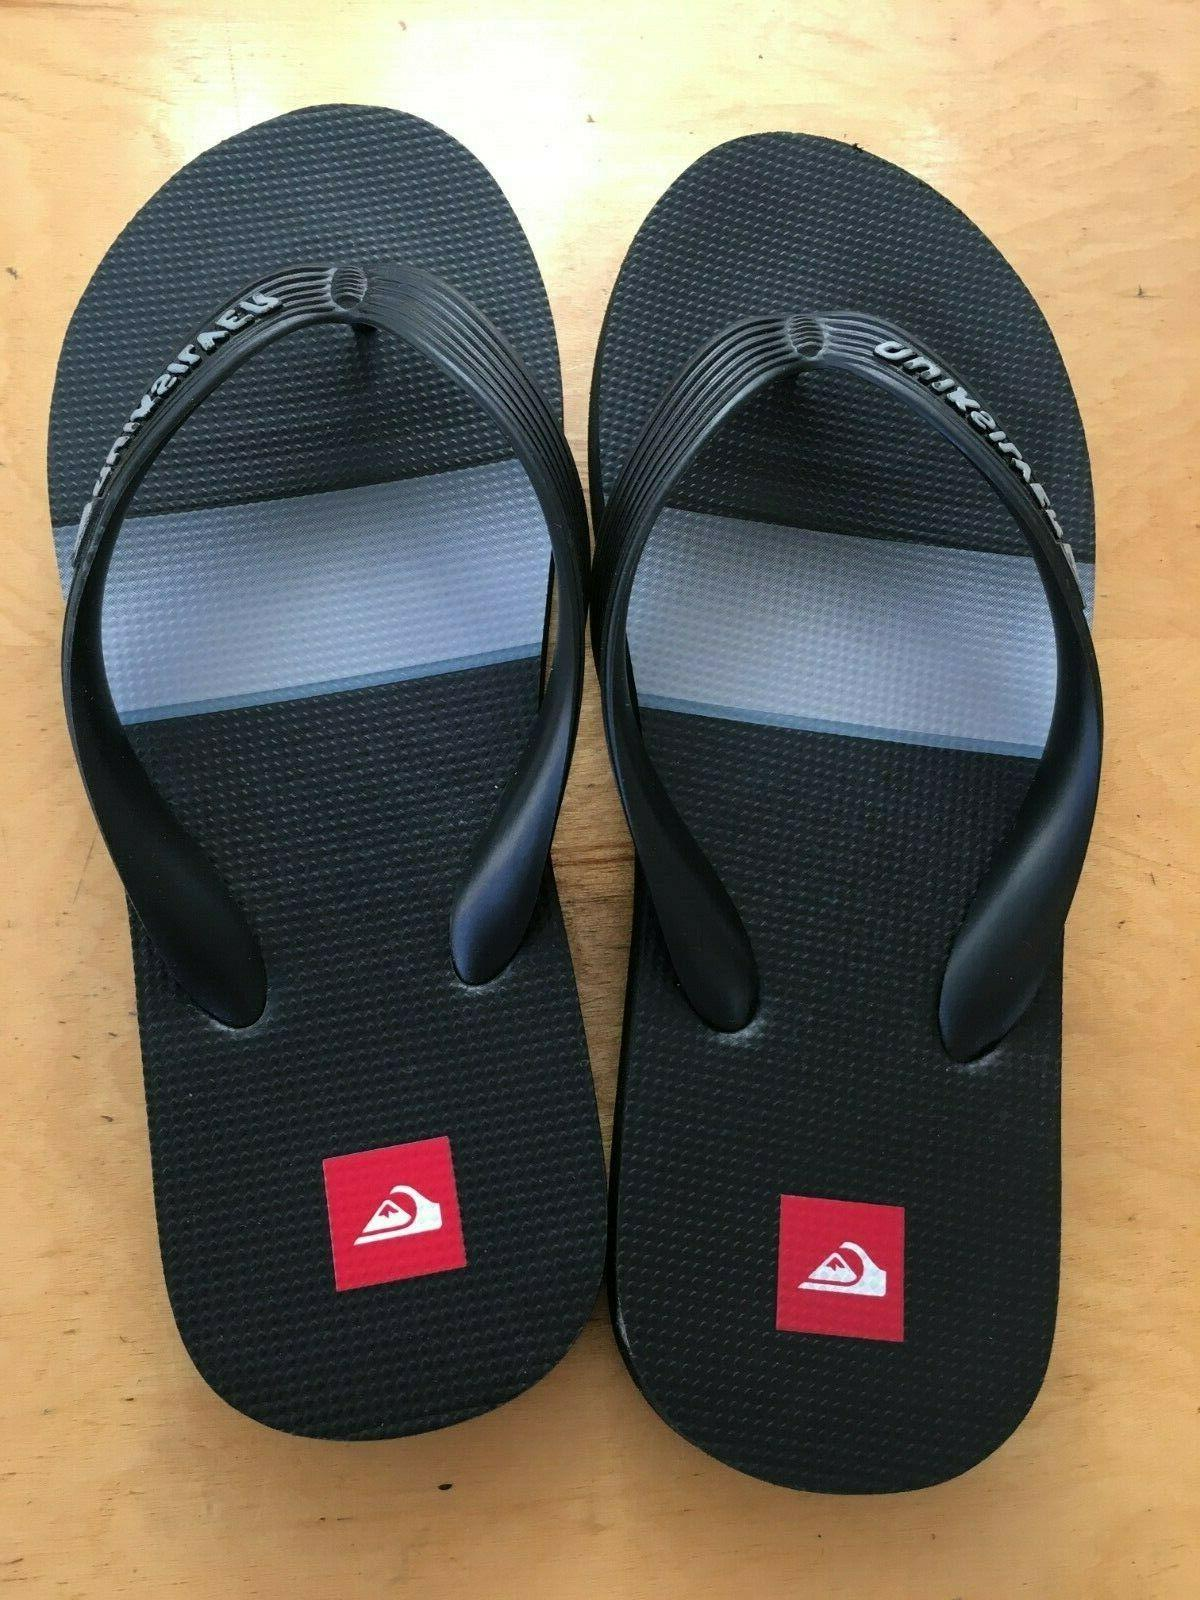 Big Flip Sandals Size 4/5